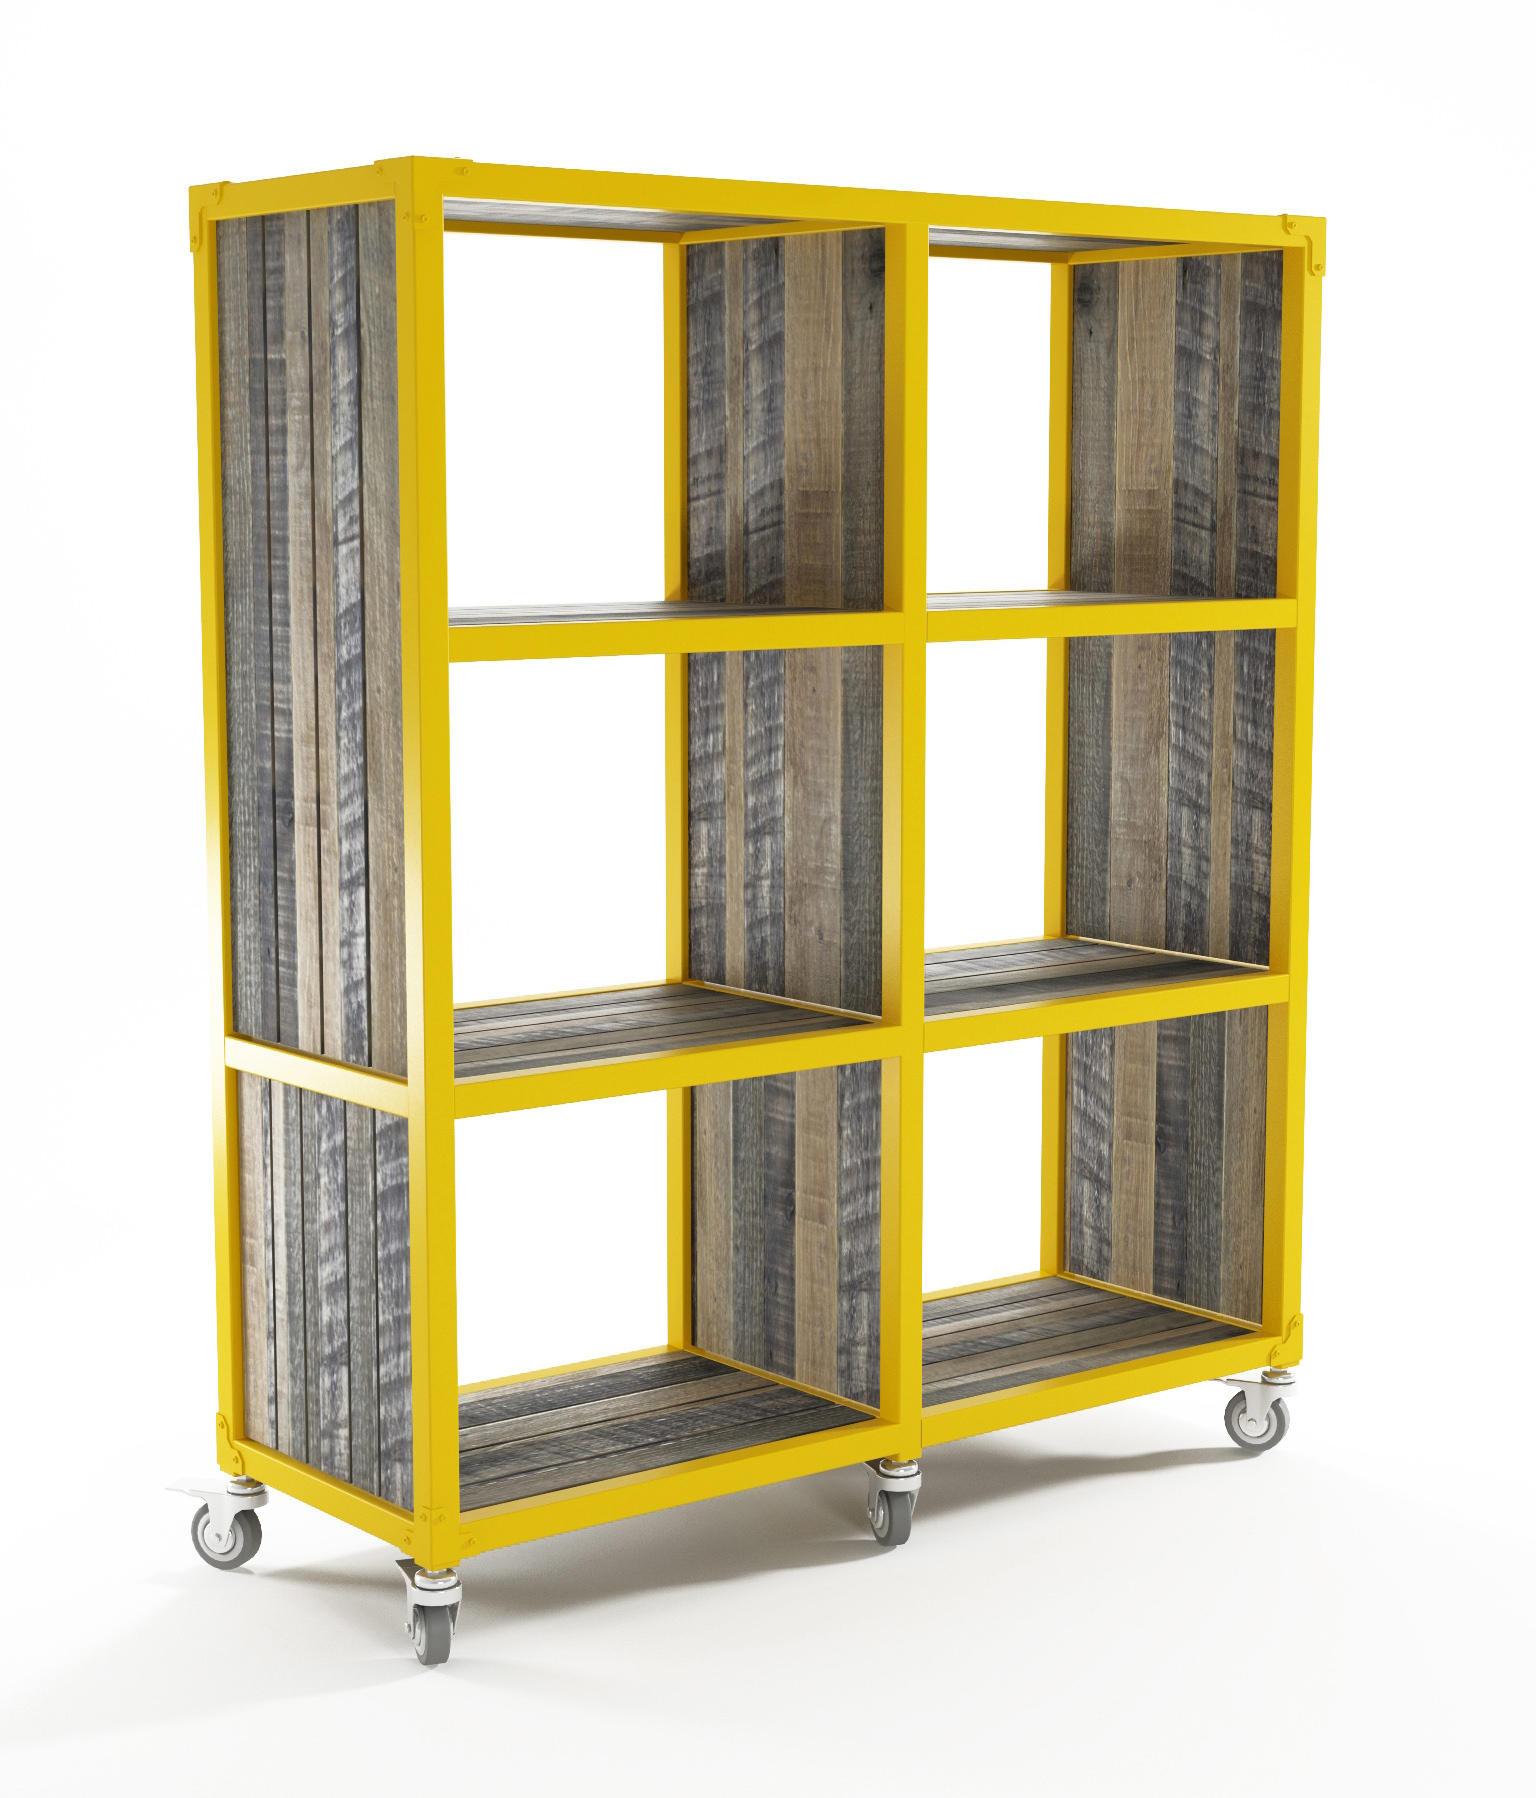 Atelier vertical rack 6 compartments estanter a de for Estanteria vertical